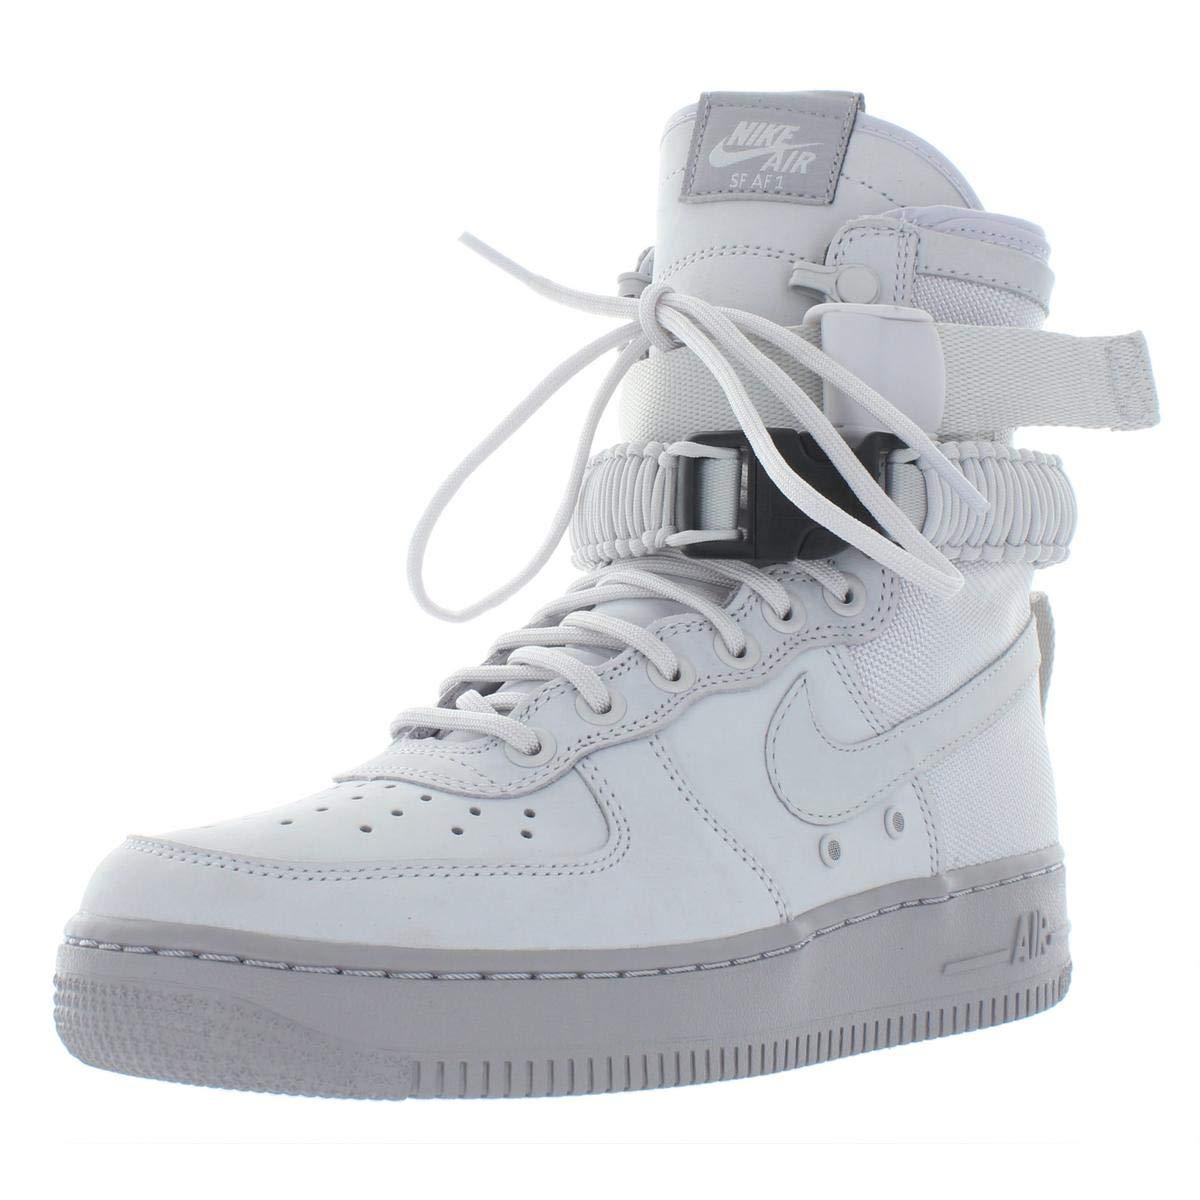 reputable site 8a855 9adaf Galleon - Nike Women s SF Air Force 1